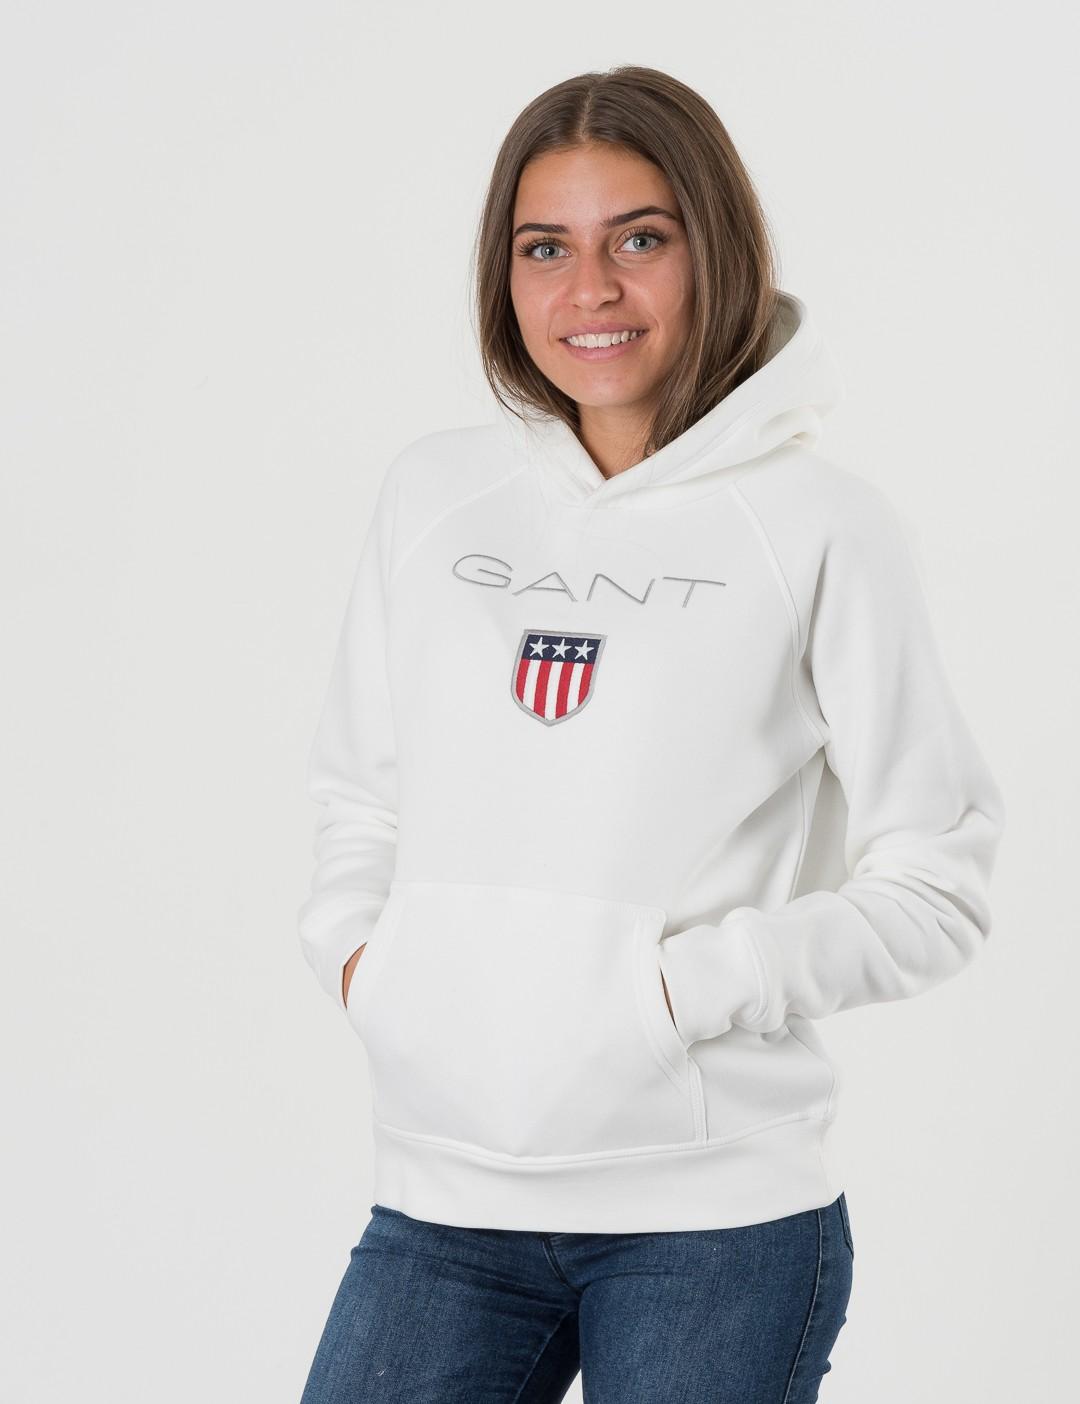 04a2b8e4 Om Gant Shield Logo Sweat Hoodie - Hvit från Gant | KidsBrandStore